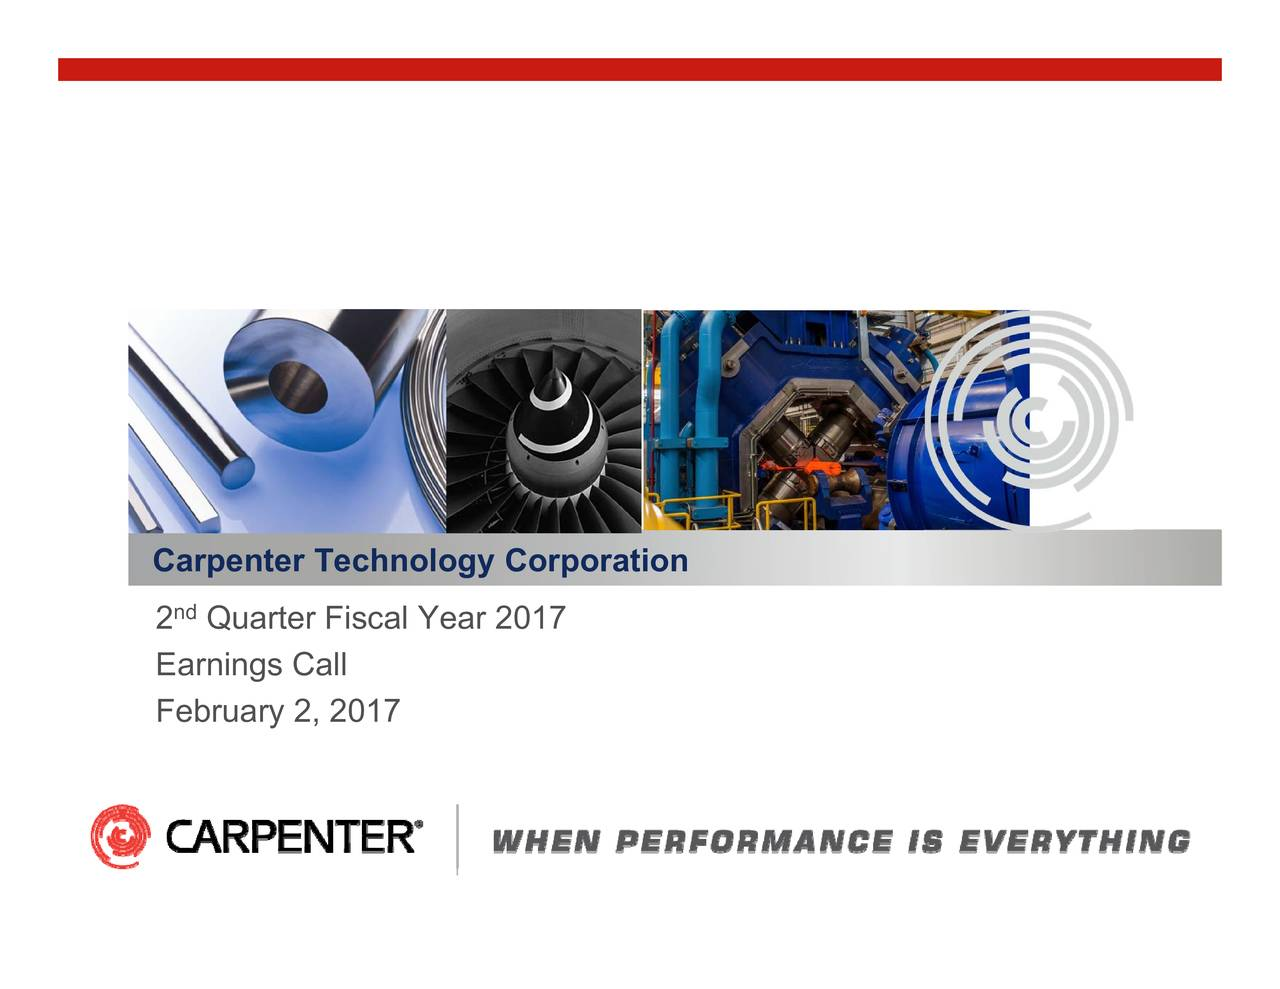 nd Carpenter Technology Corporation